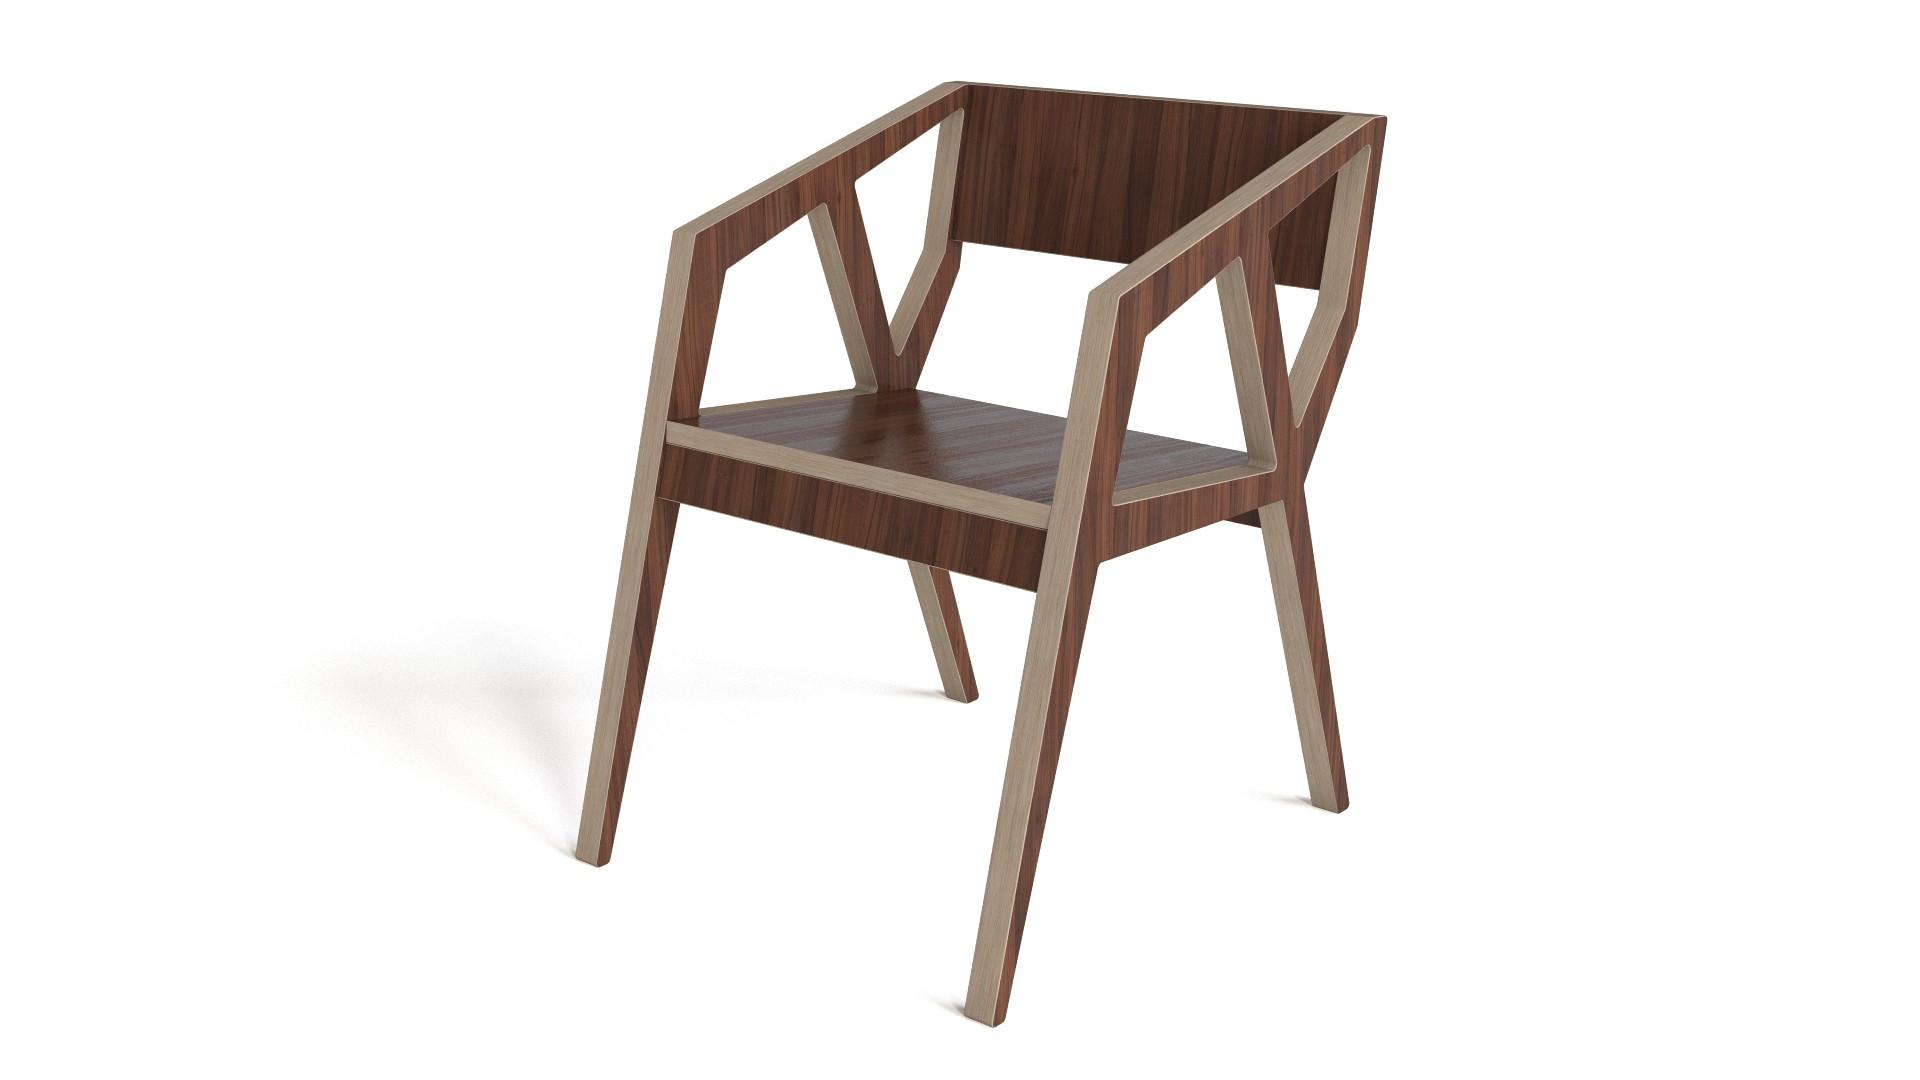 Stupendous Kart Chair Flyingarchitecture Ibusinesslaw Wood Chair Design Ideas Ibusinesslaworg